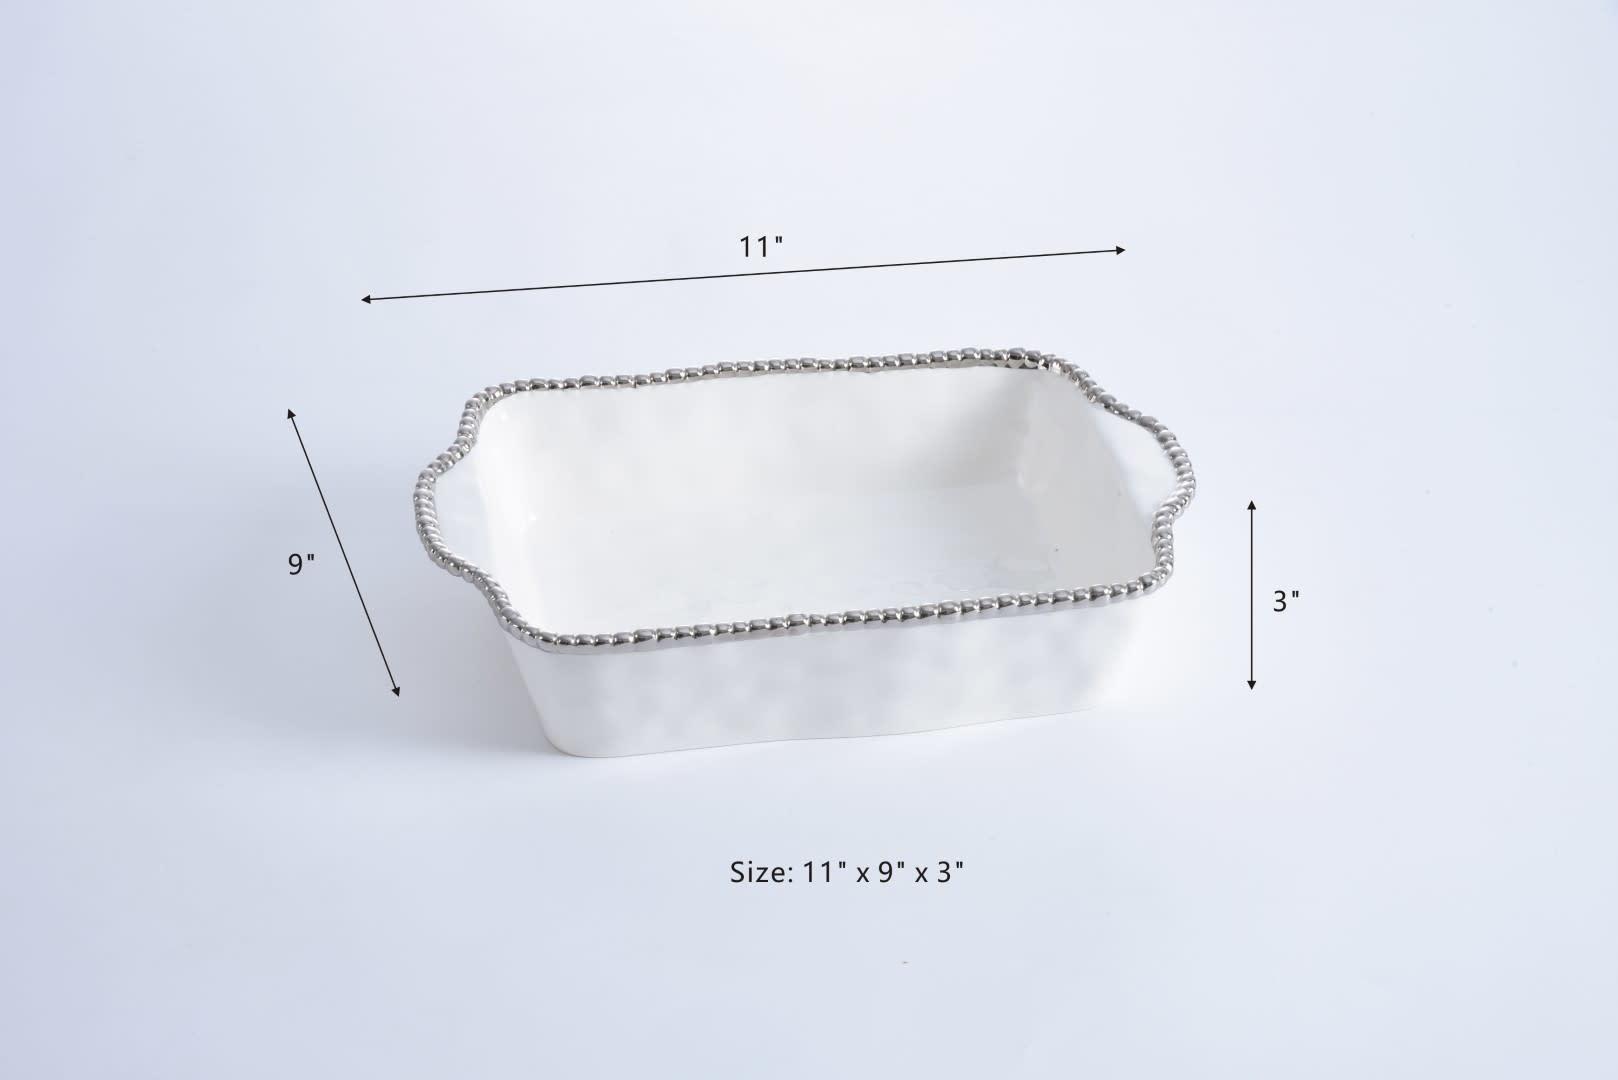 Beaded Ceramic White & Silver Baking Dish